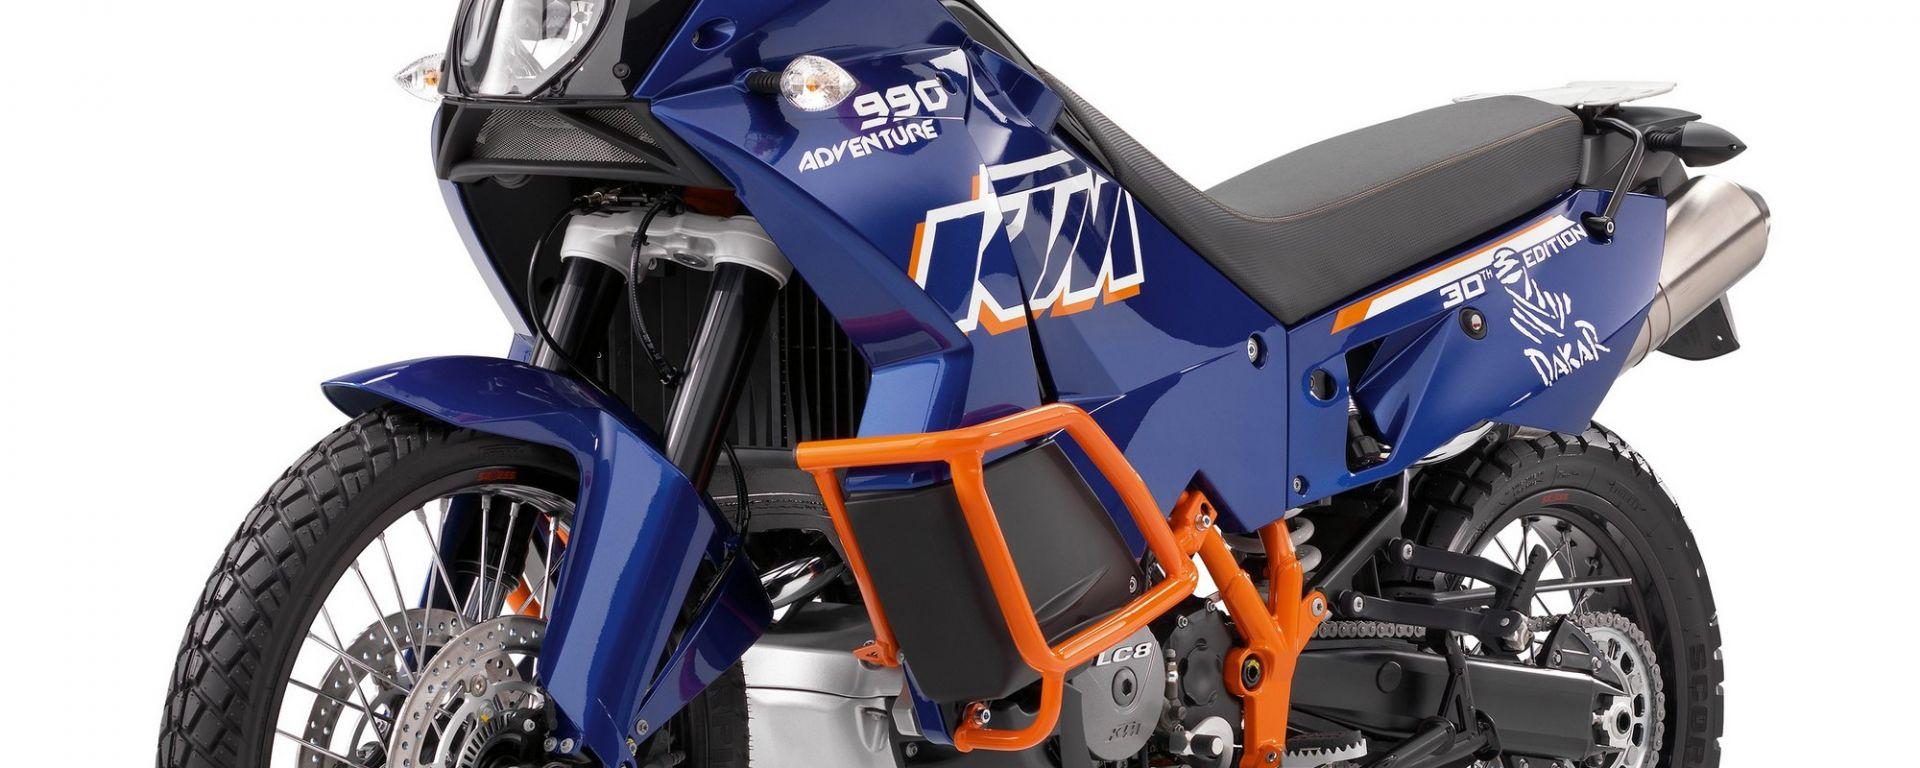 KTM 990 Adventure Dakar 30th Edition